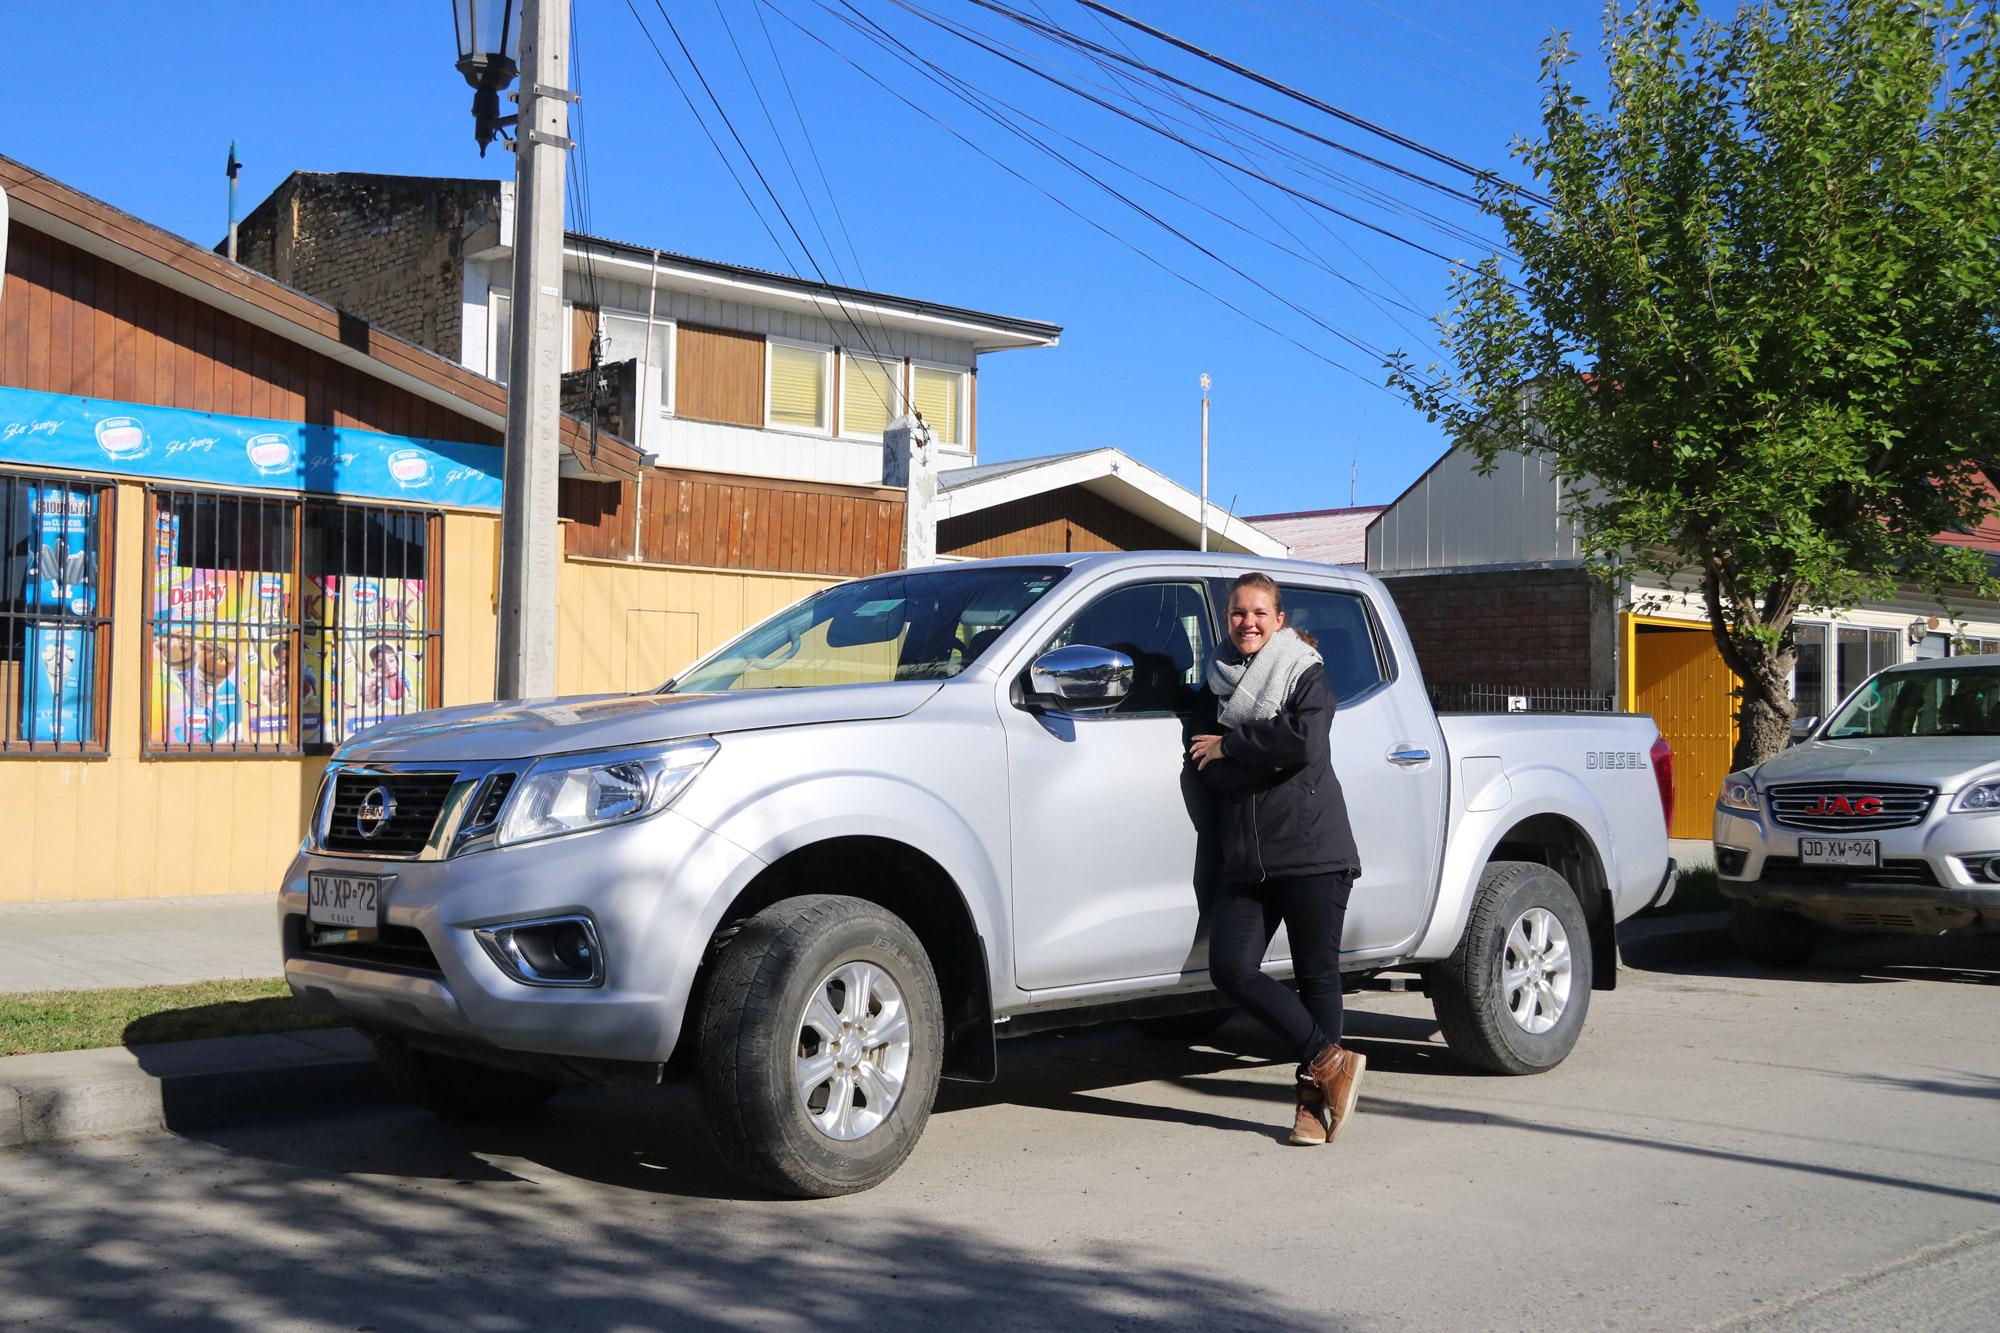 Patagonië - Puerto Natales - auto